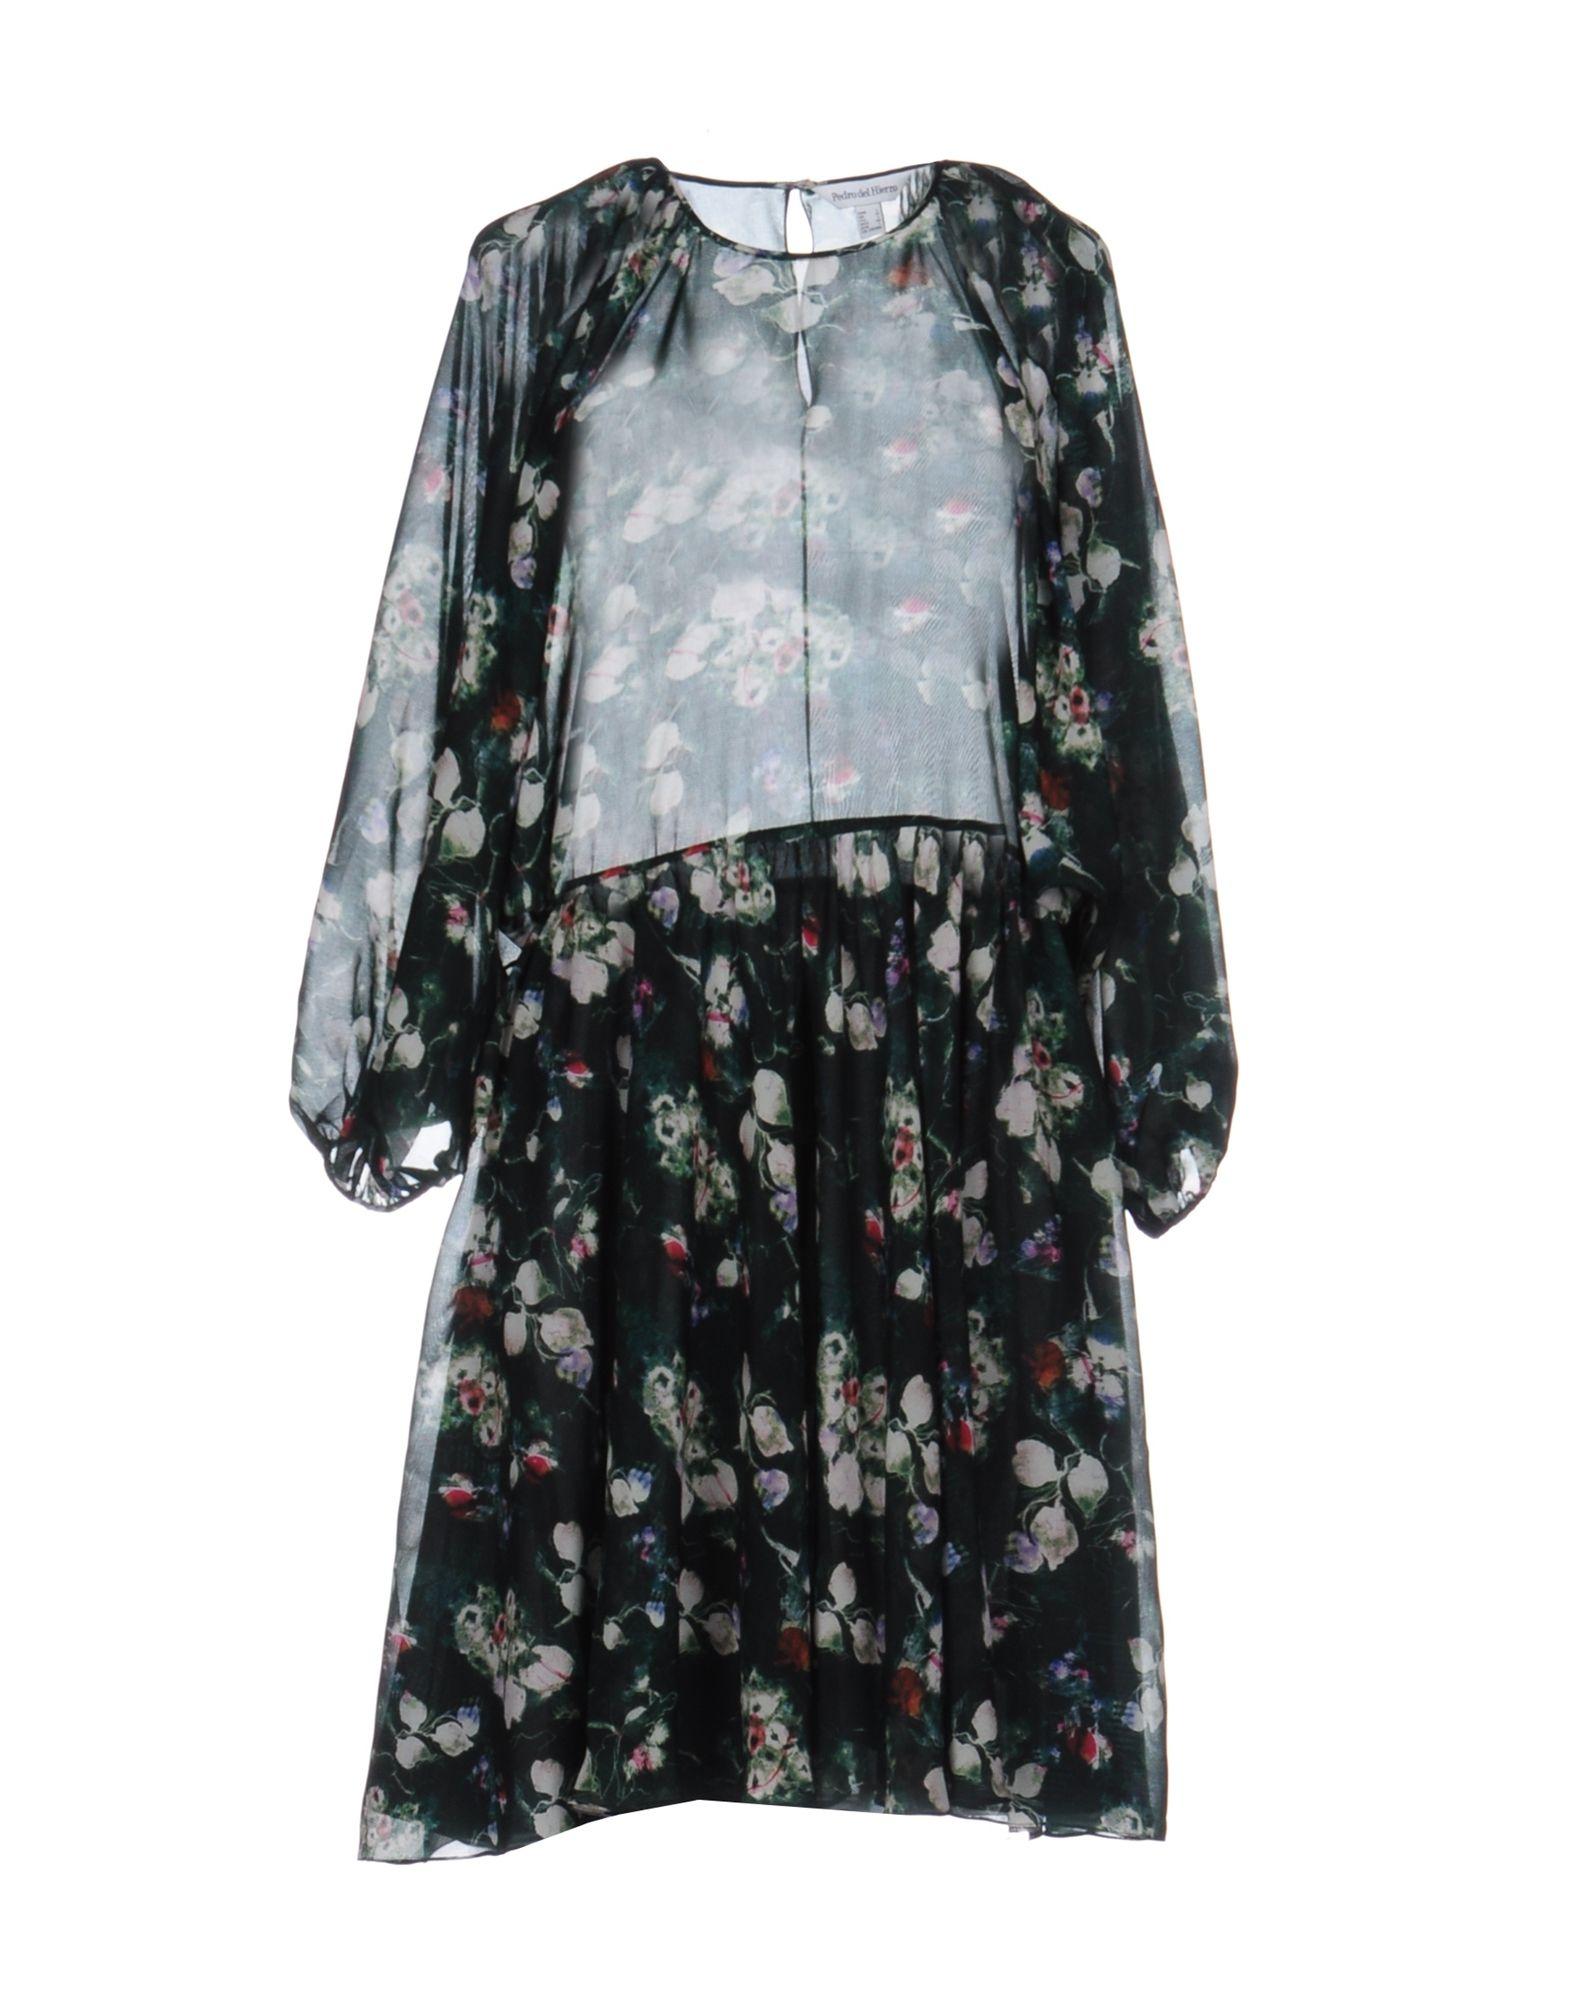 PEDRO DEL HIERRO Short Dress in Green